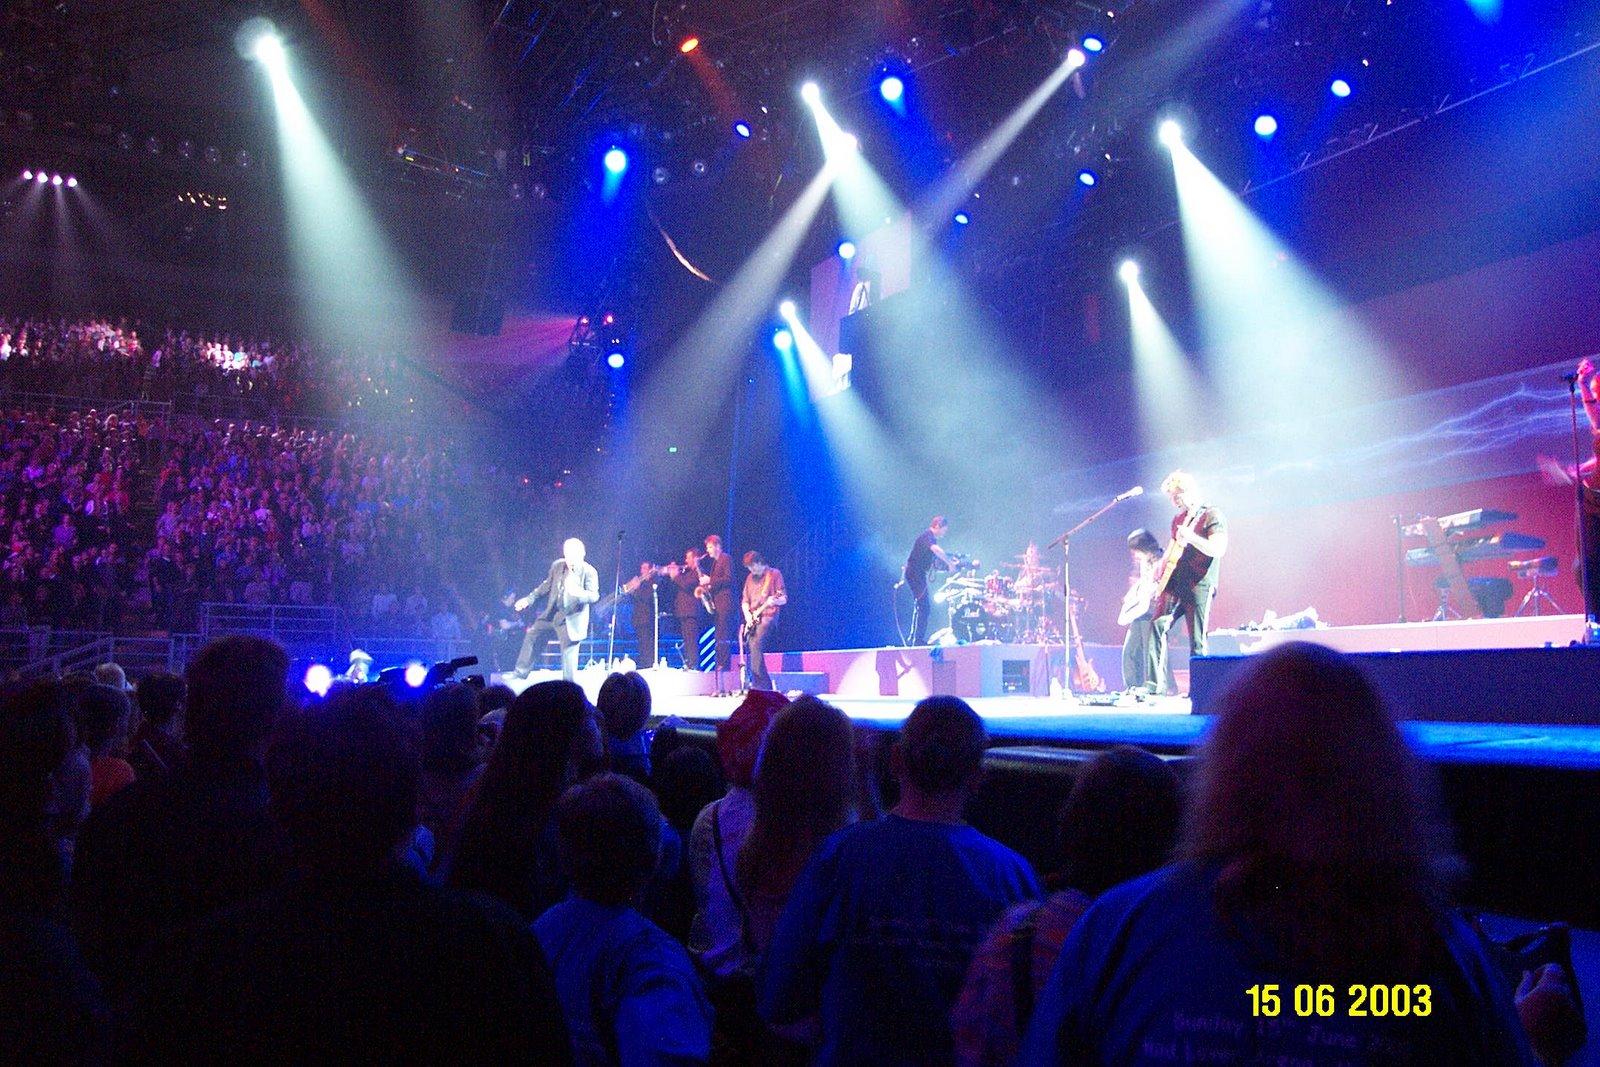 Sean andi 39 s concert photos john farnham rod laver for Door 9 rod laver arena